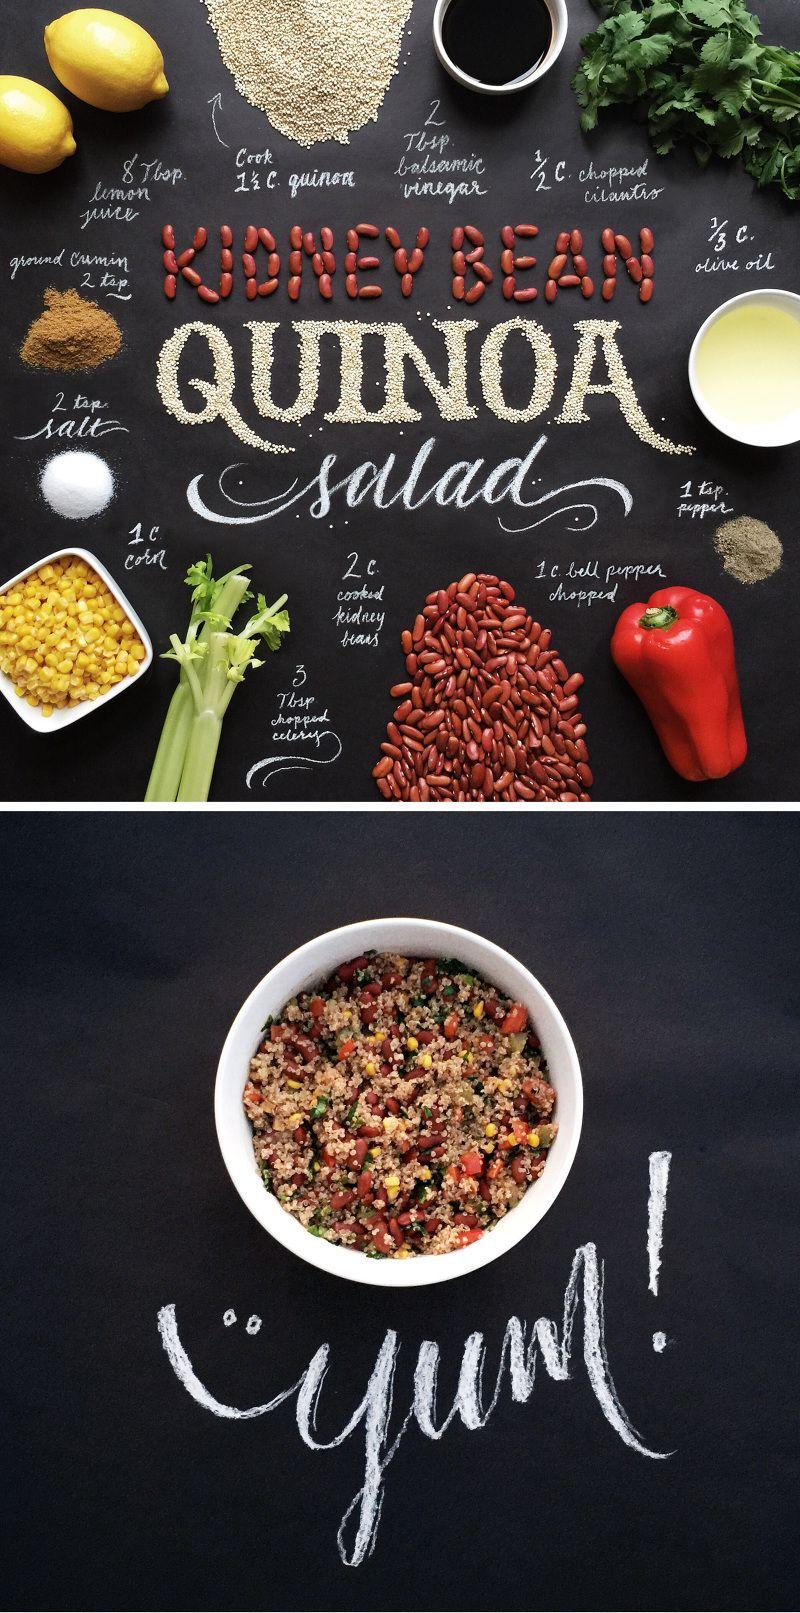 Food lettering 5